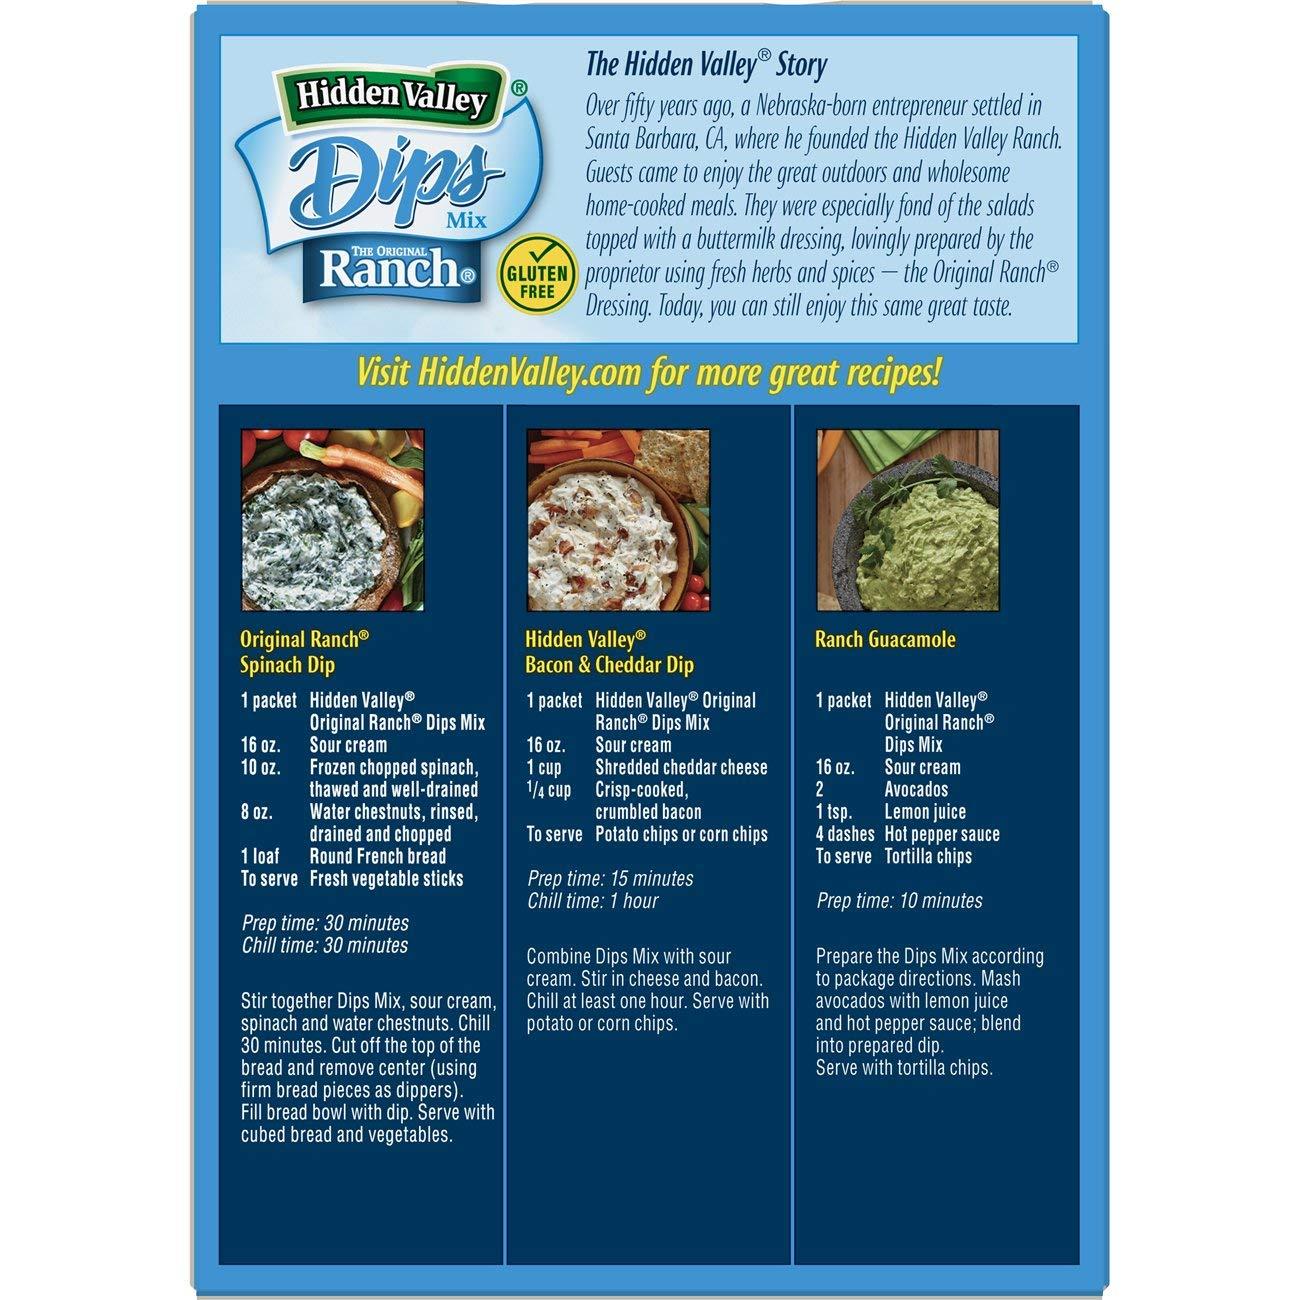 Hidden Valley Original Ranch Dips Mix Gluten Free Keto Friendly 4 Packets